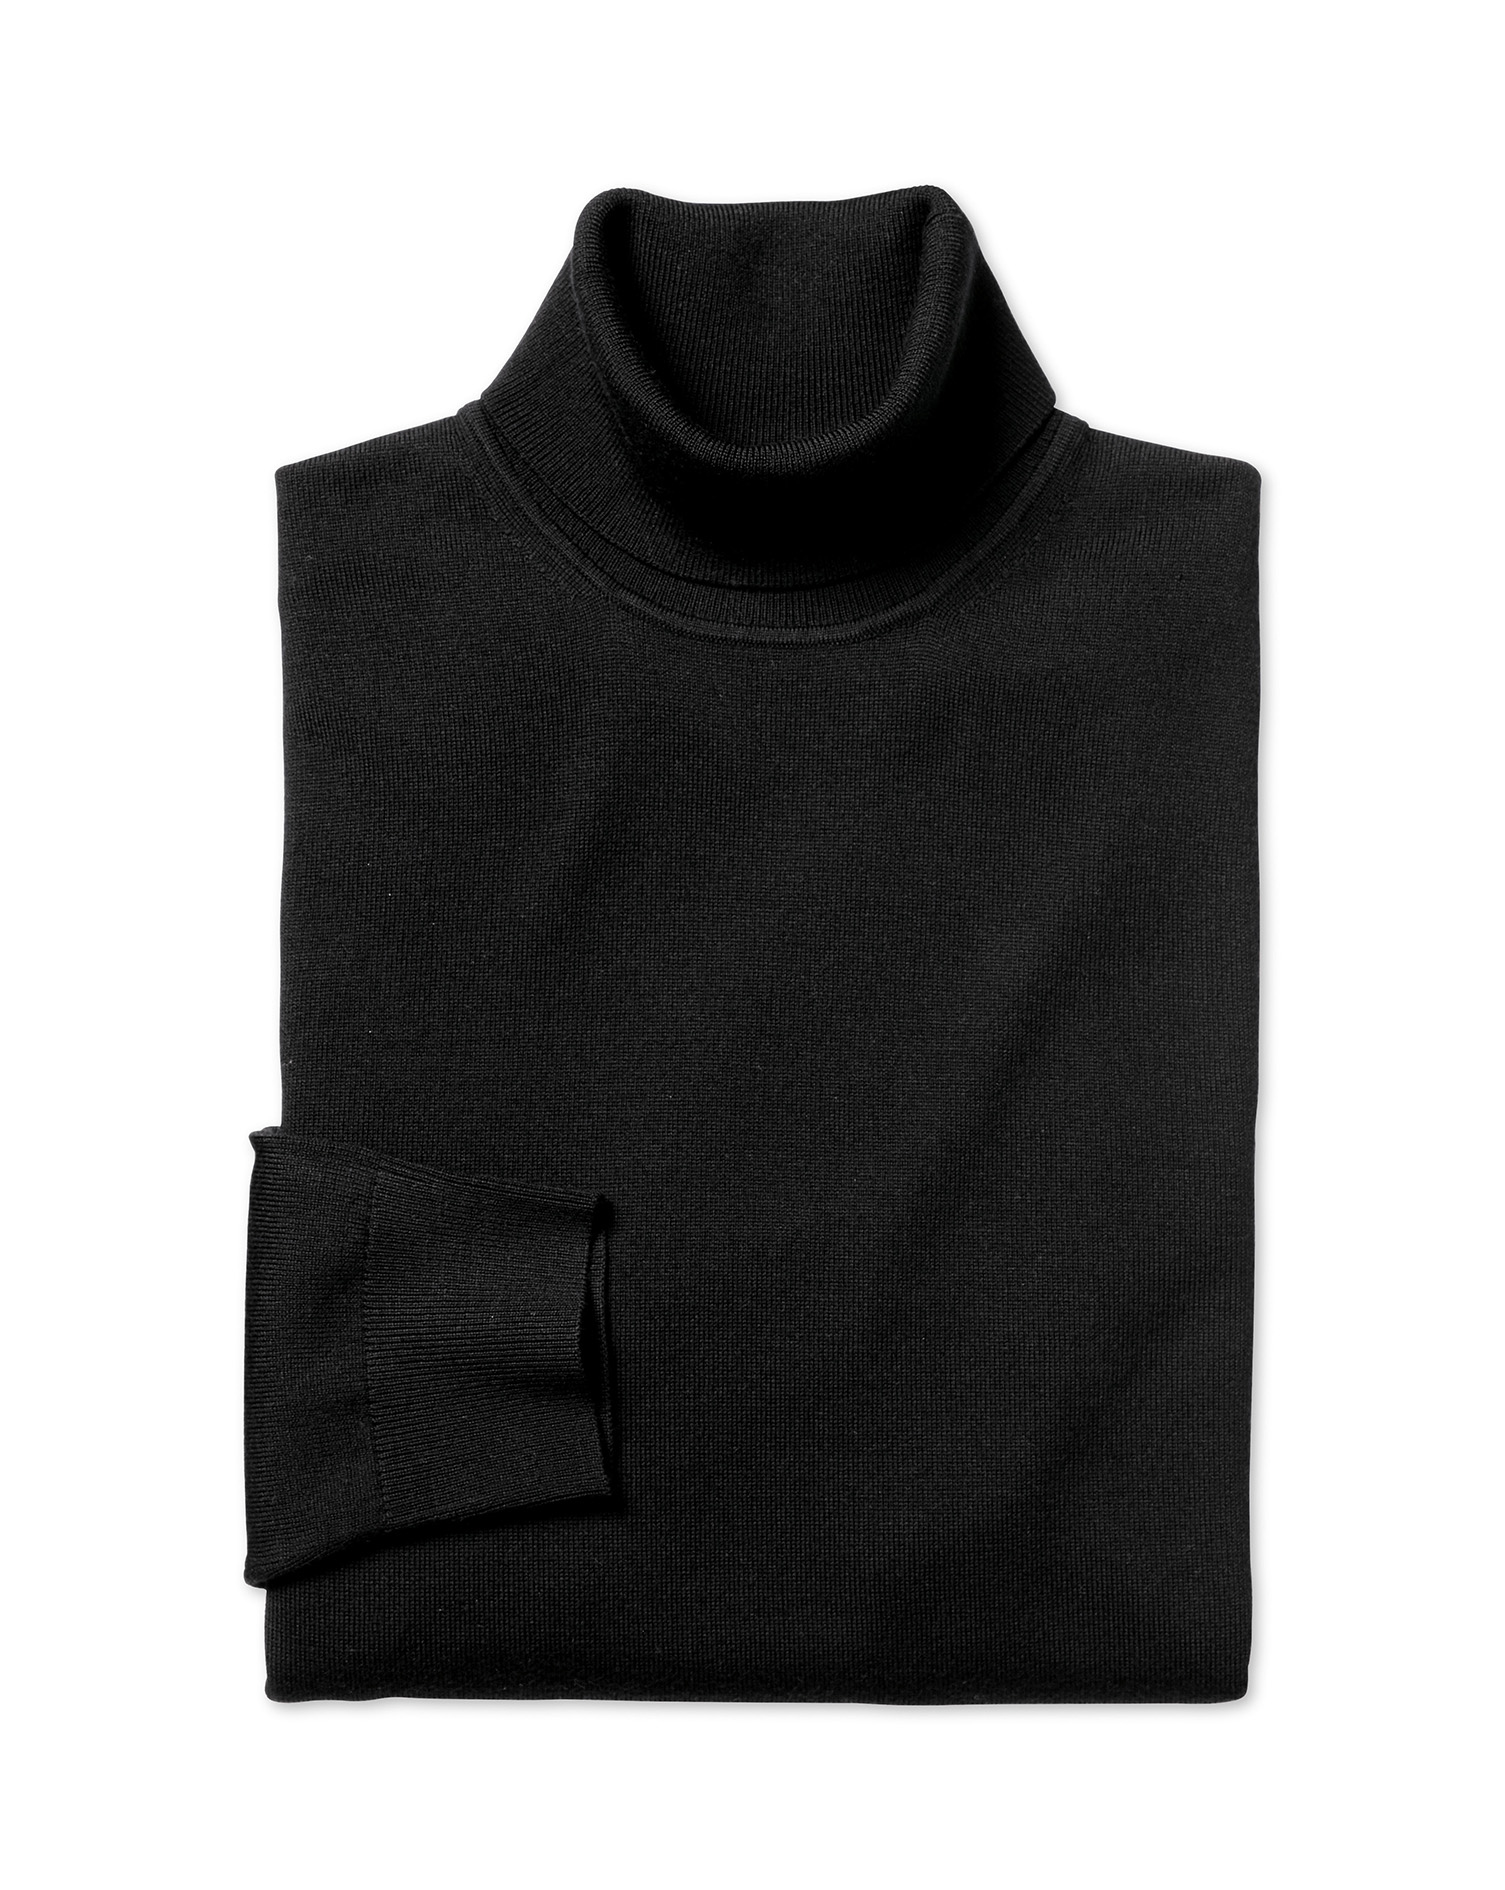 Black Merino Wool Roll Neck Jumper Size Medium by Charles Tyrwhitt